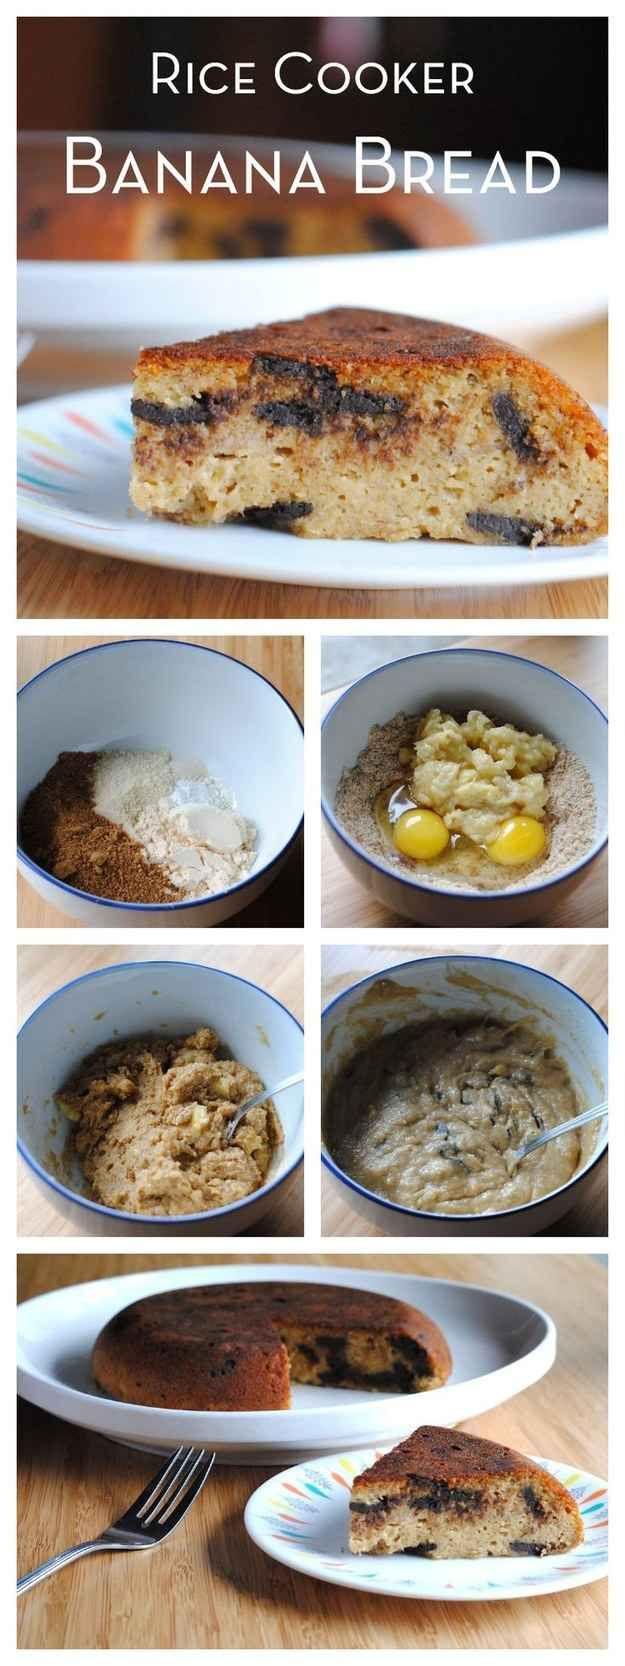 Rice Cooker Banana Bread